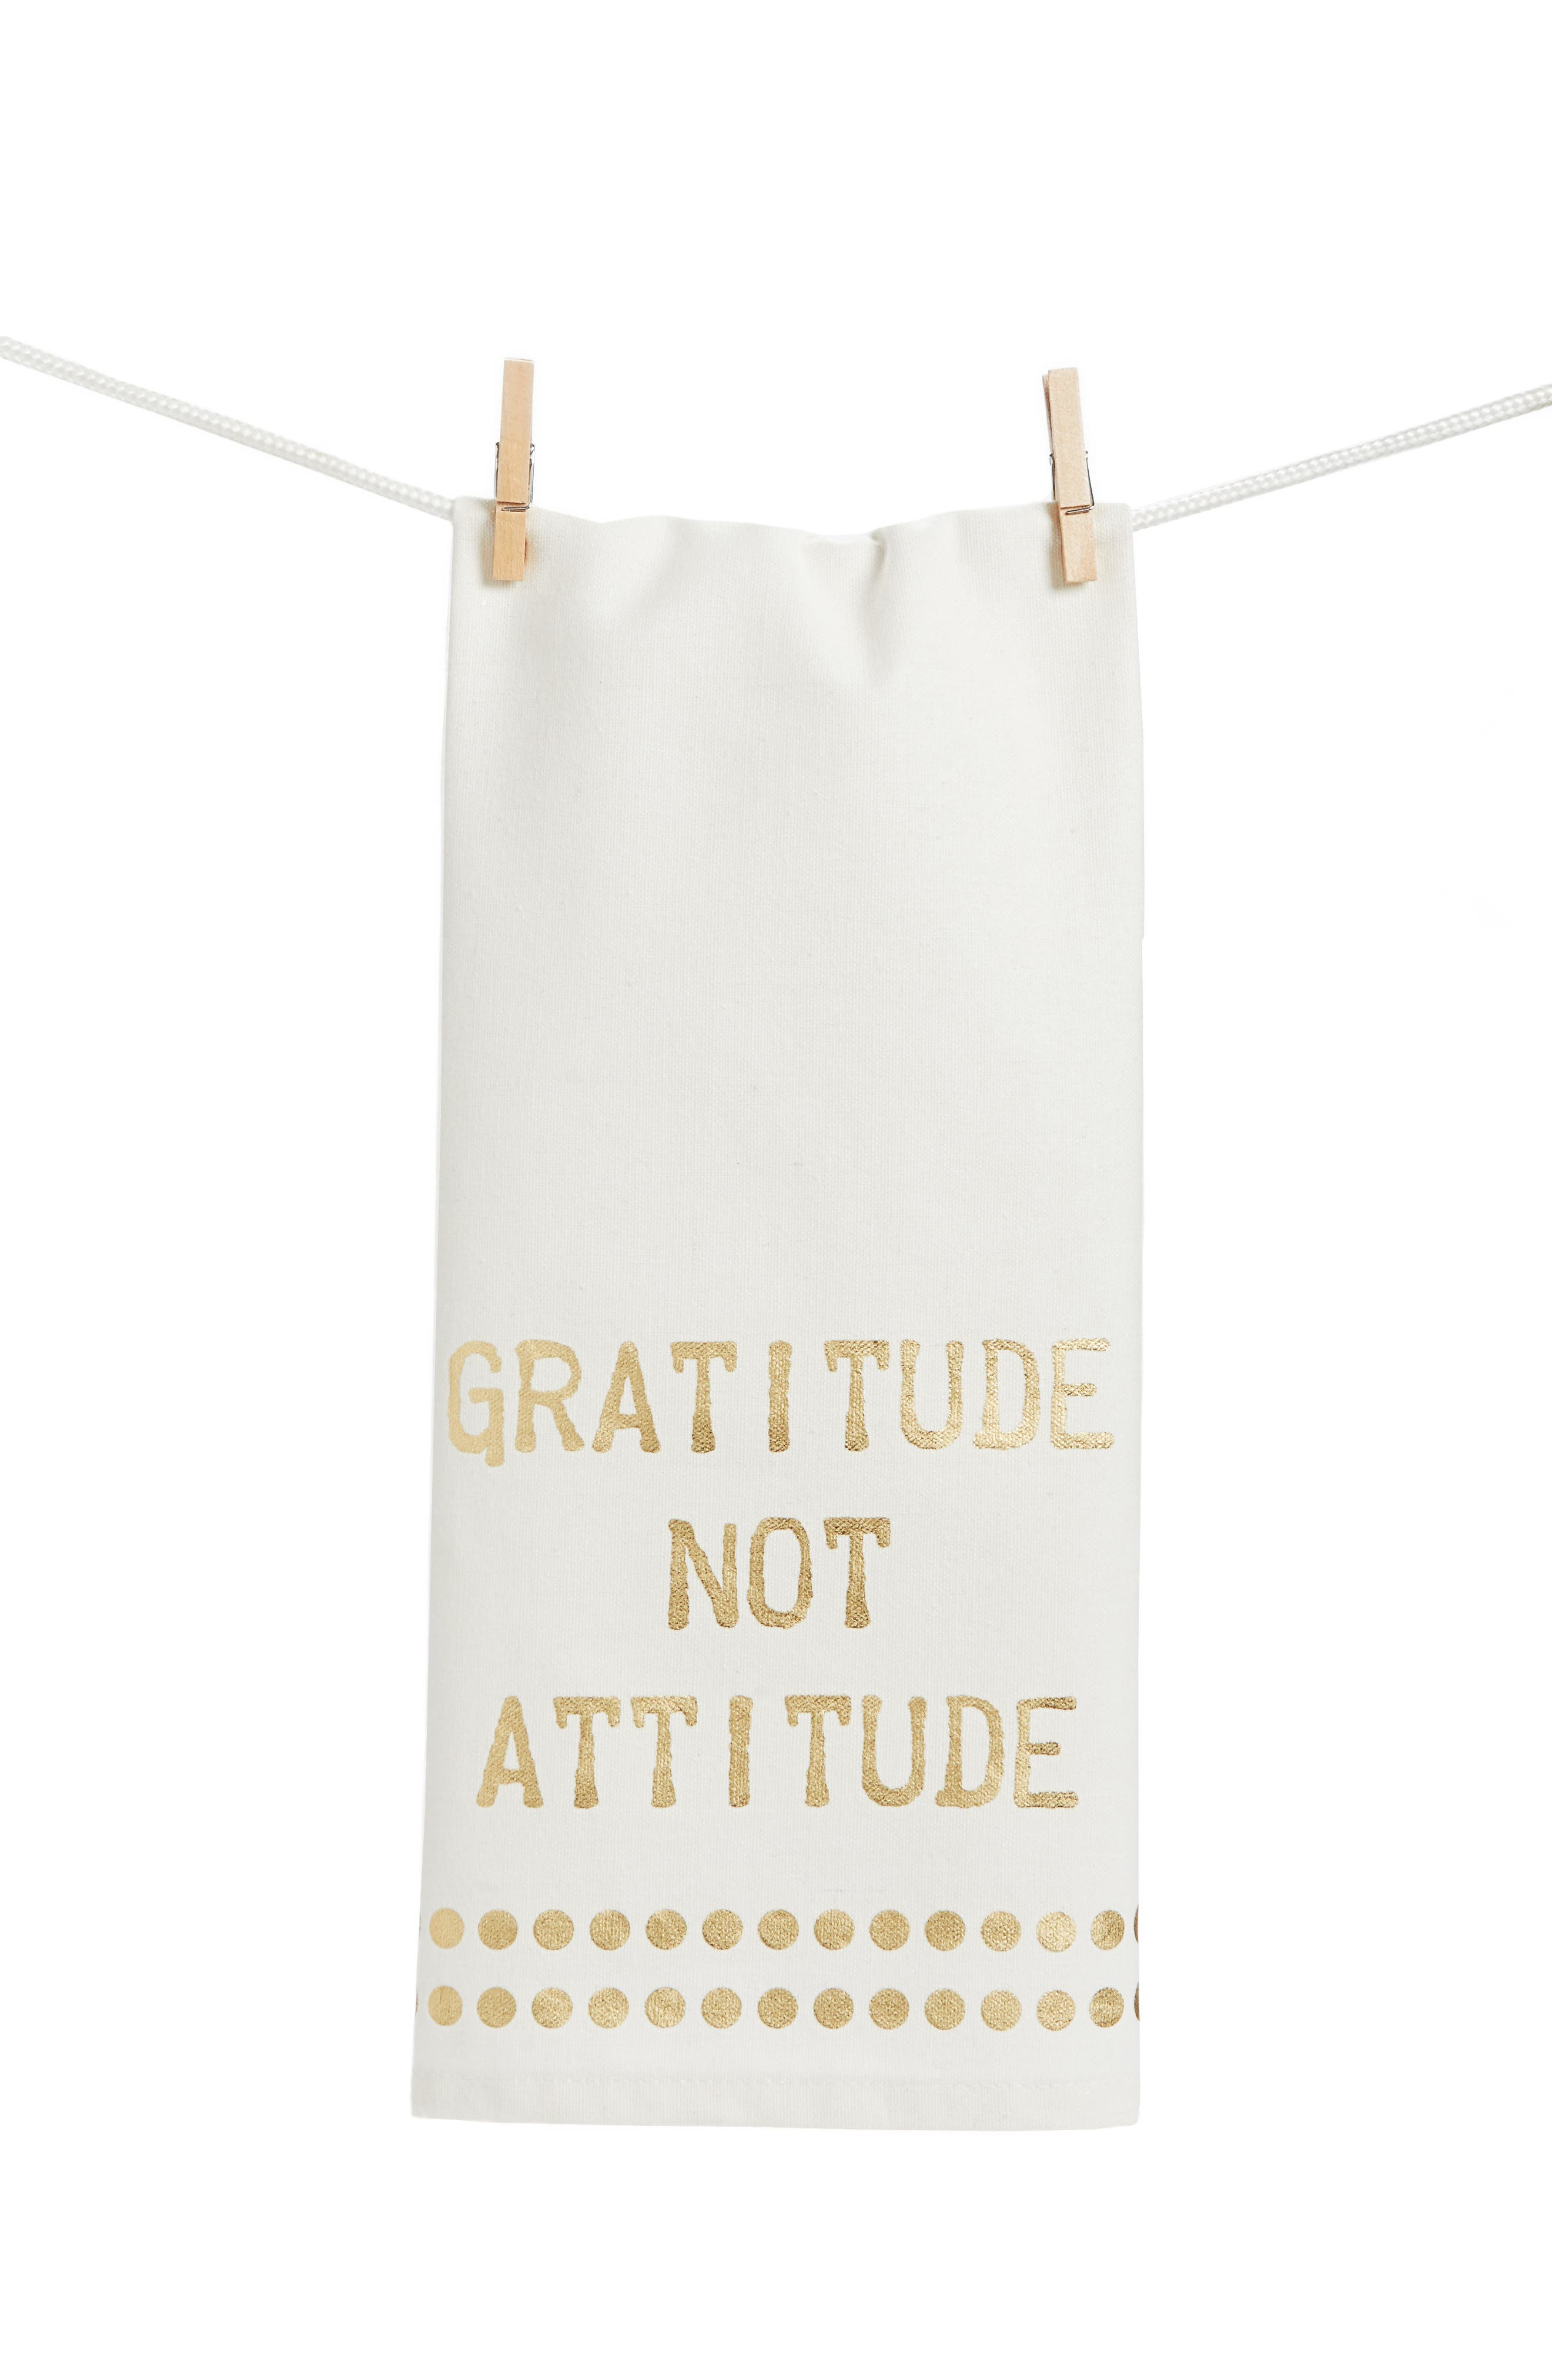 Gratitude Not Attitude Set of 2 Dish Towels,                             Main thumbnail 1, color,                             Gold